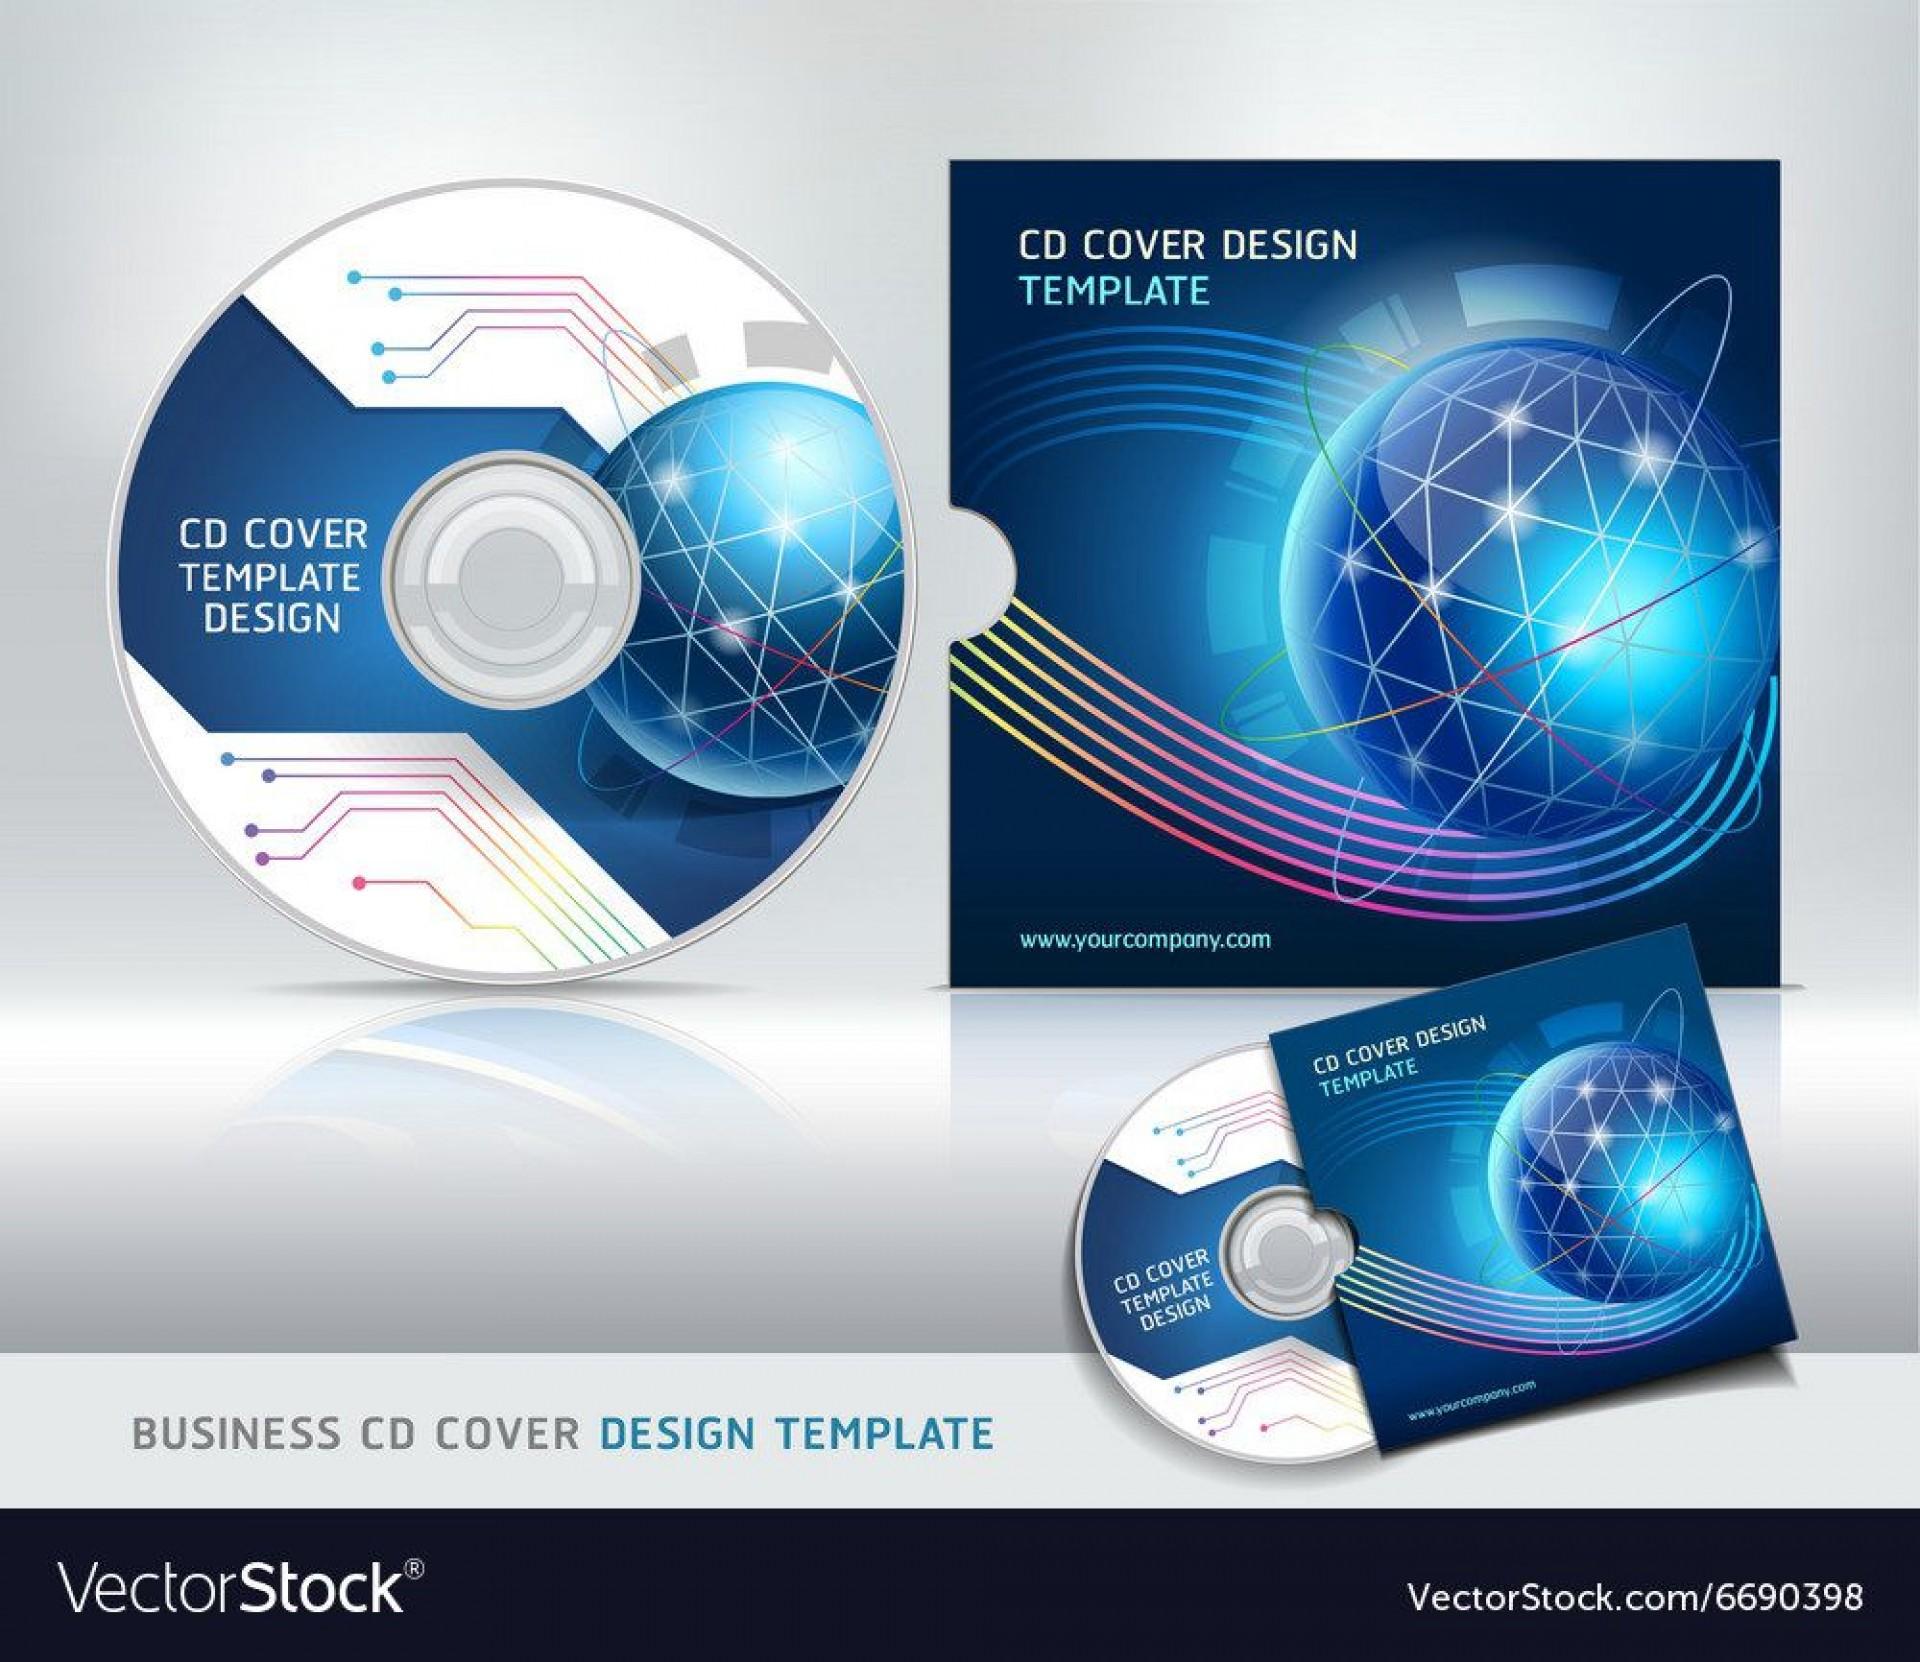 004 Impressive Cd Cover Design Template Concept  Free Vector Illustration Word Psd Download1920